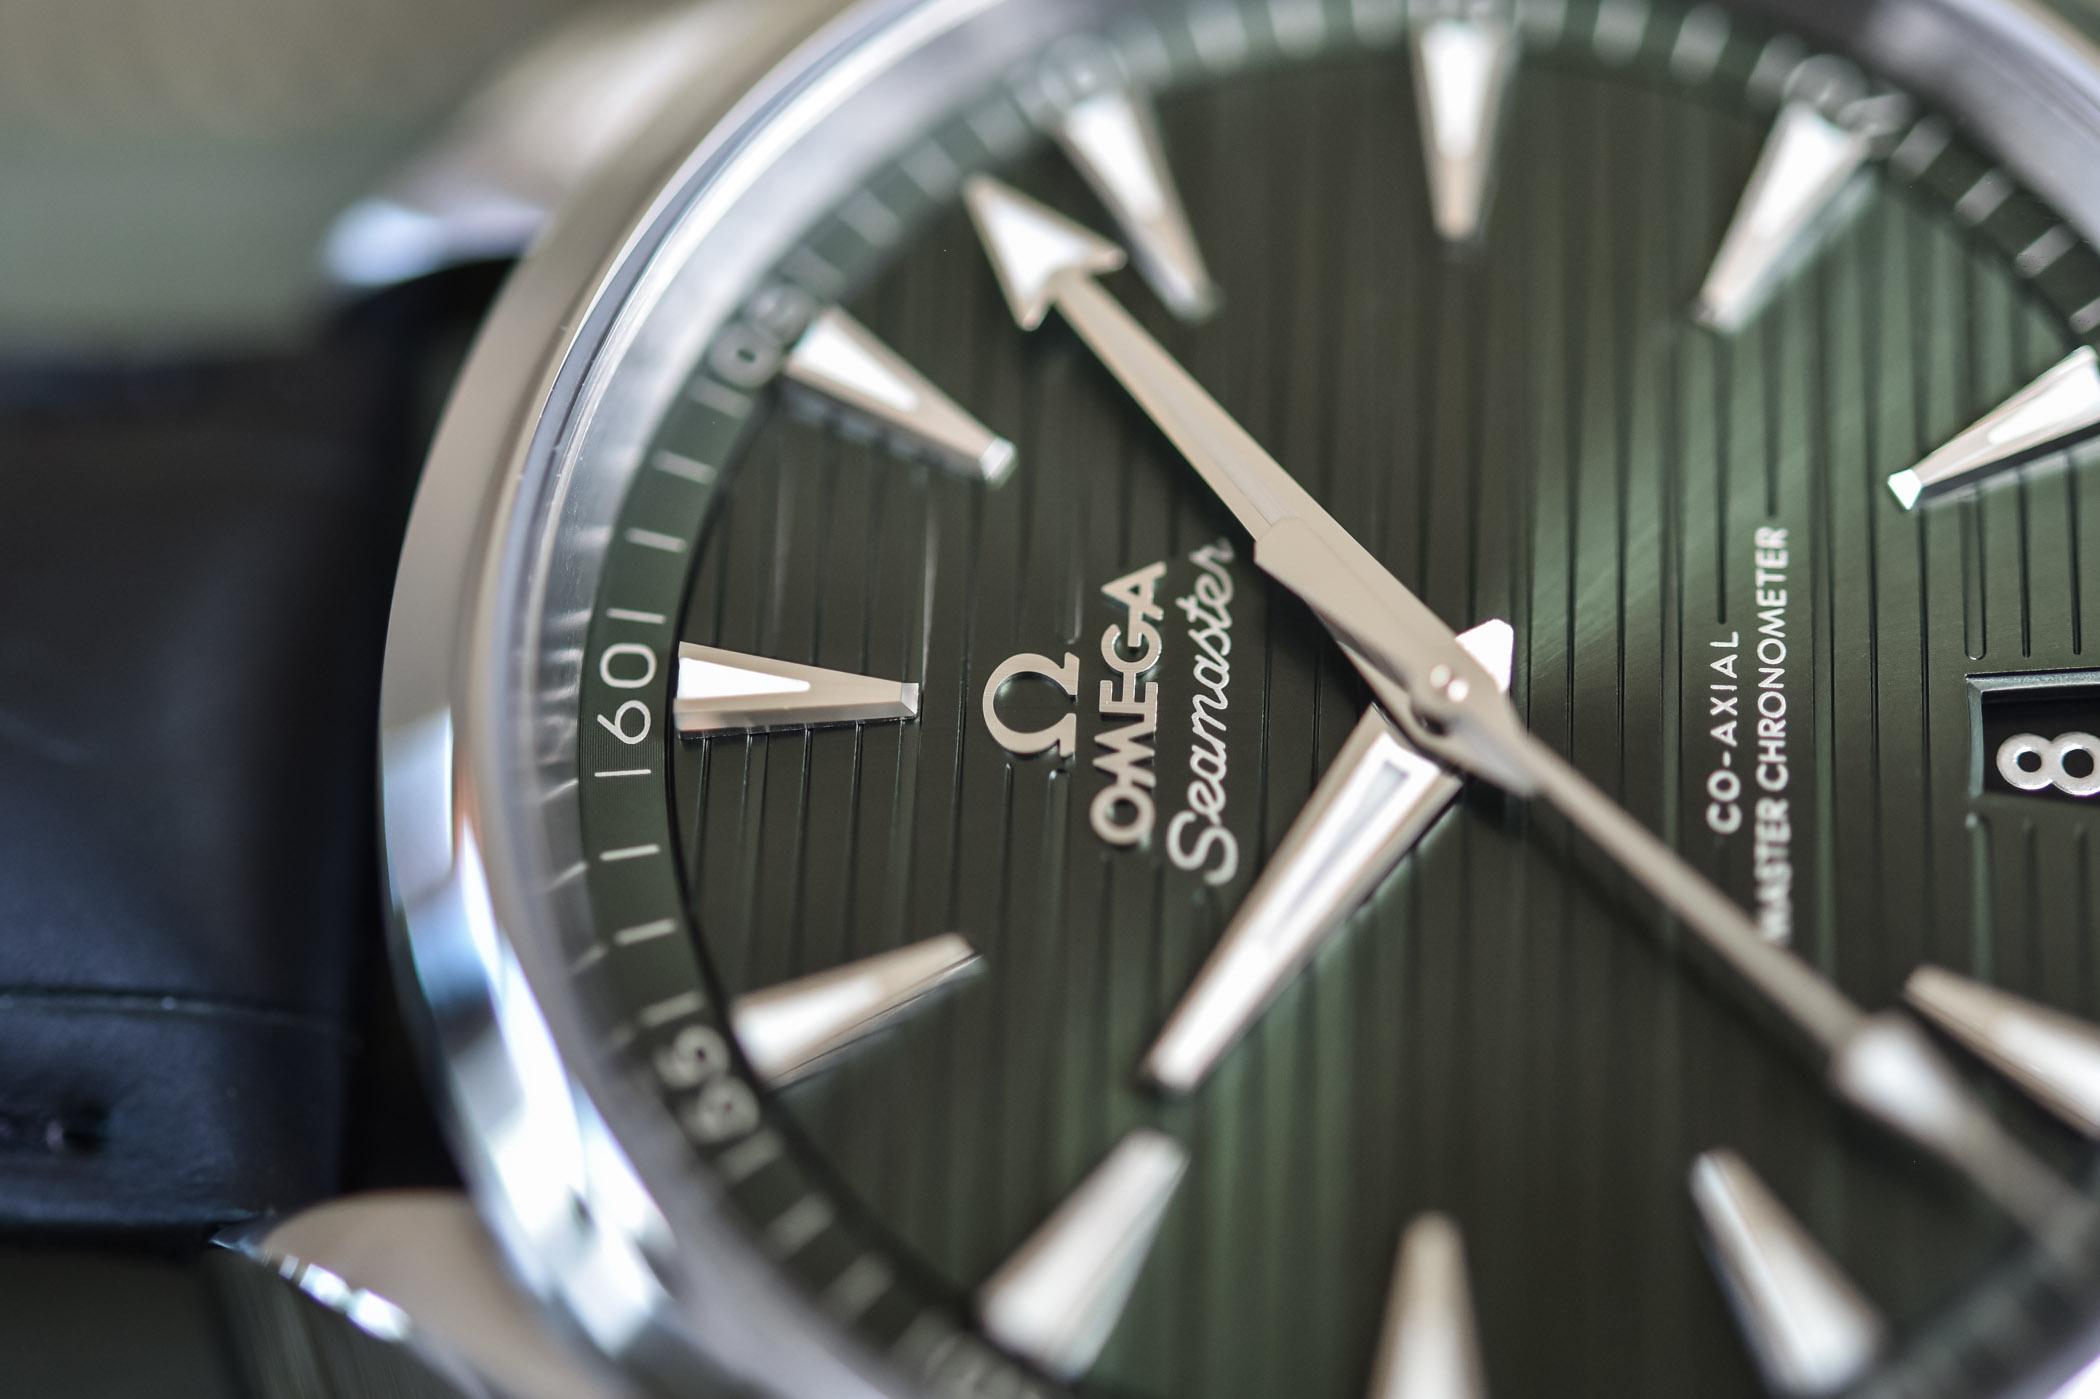 Detalle de la esfera del Omega Seamaster Aqua Terra 150M Master Chronometer